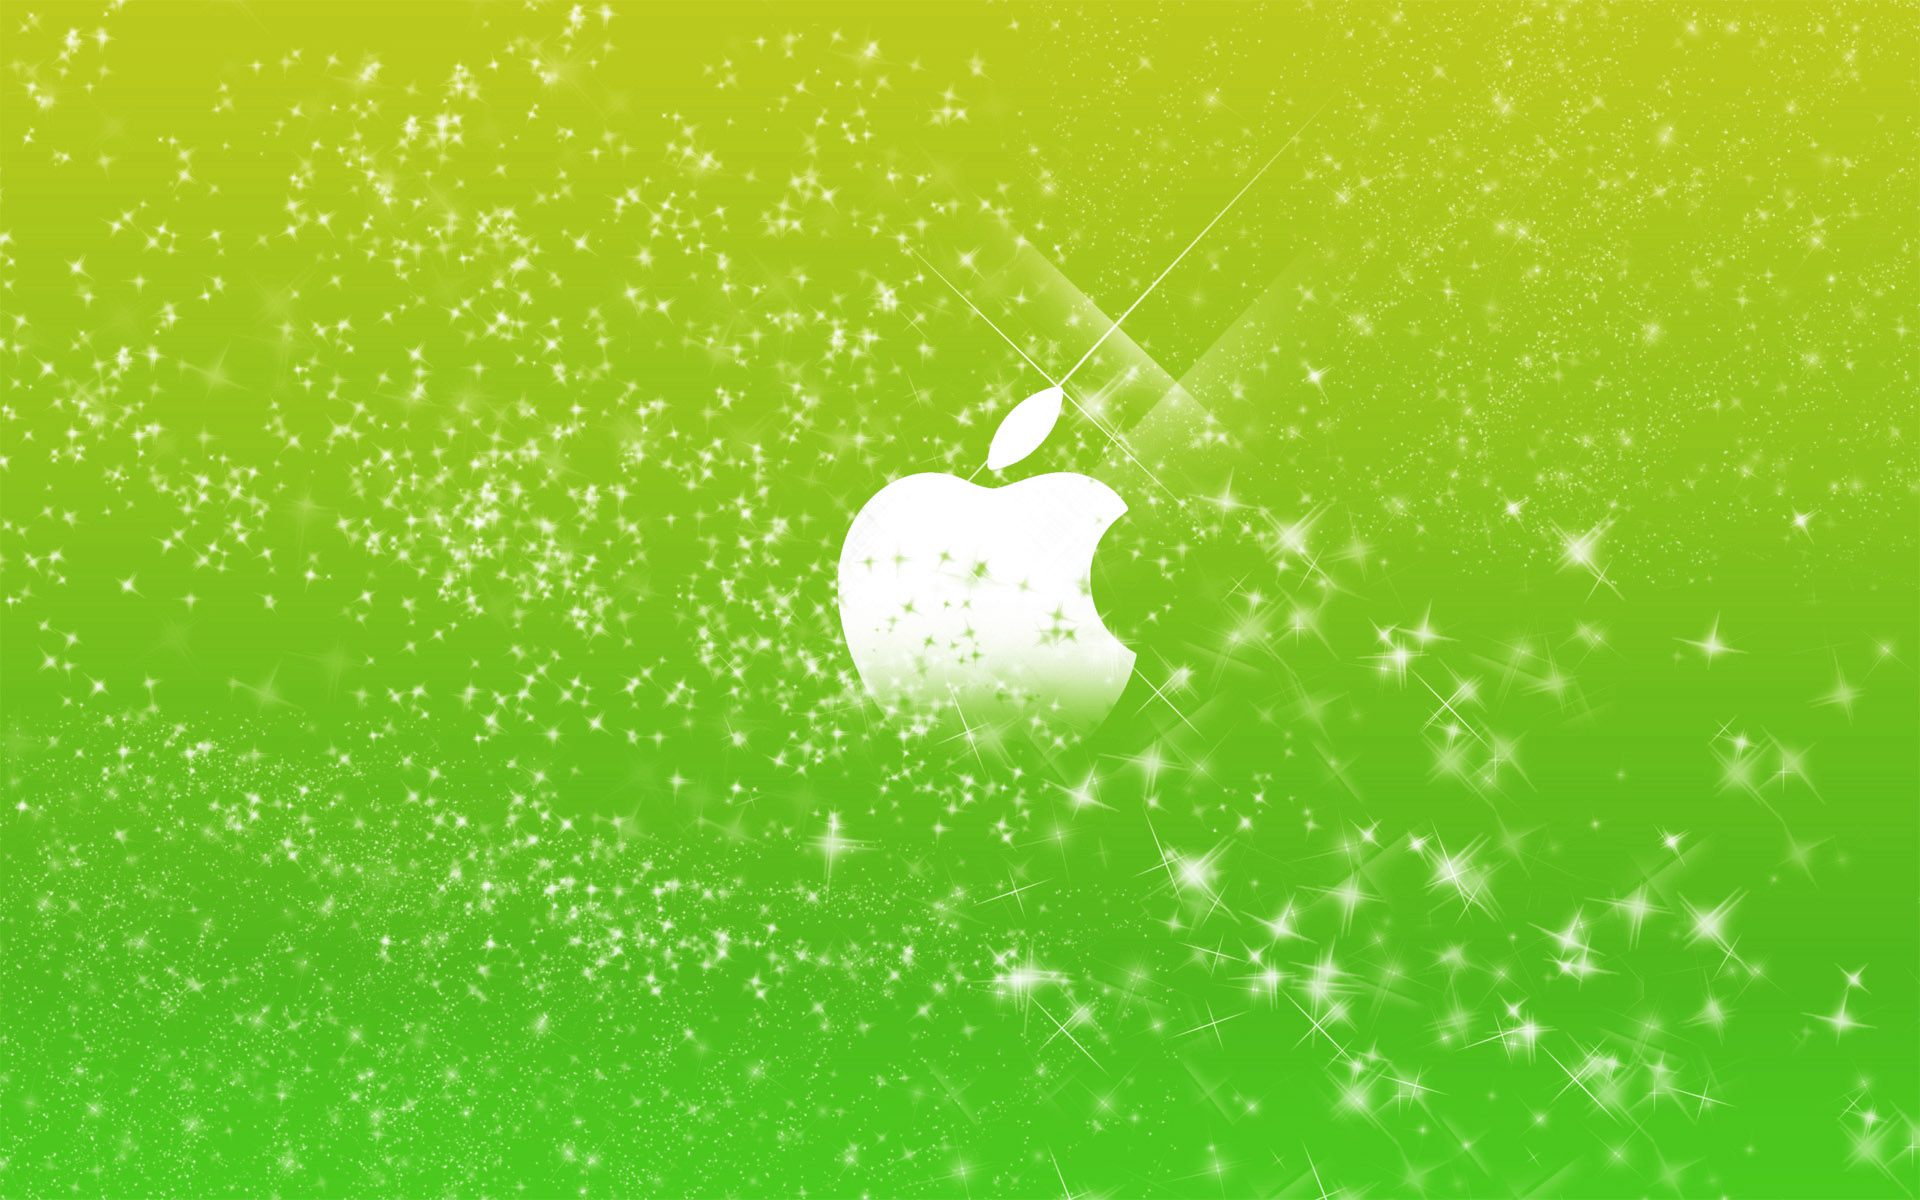 Apple Logo Wallpapers HD A28